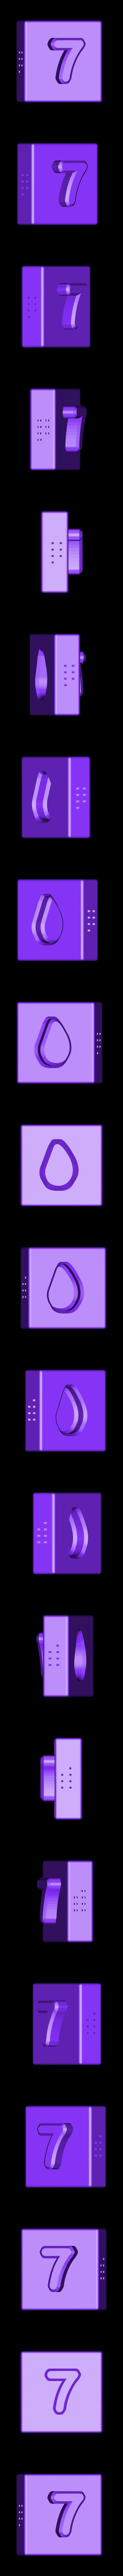 7.stl Download free STL file Mental blocks • Object to 3D print, RevK